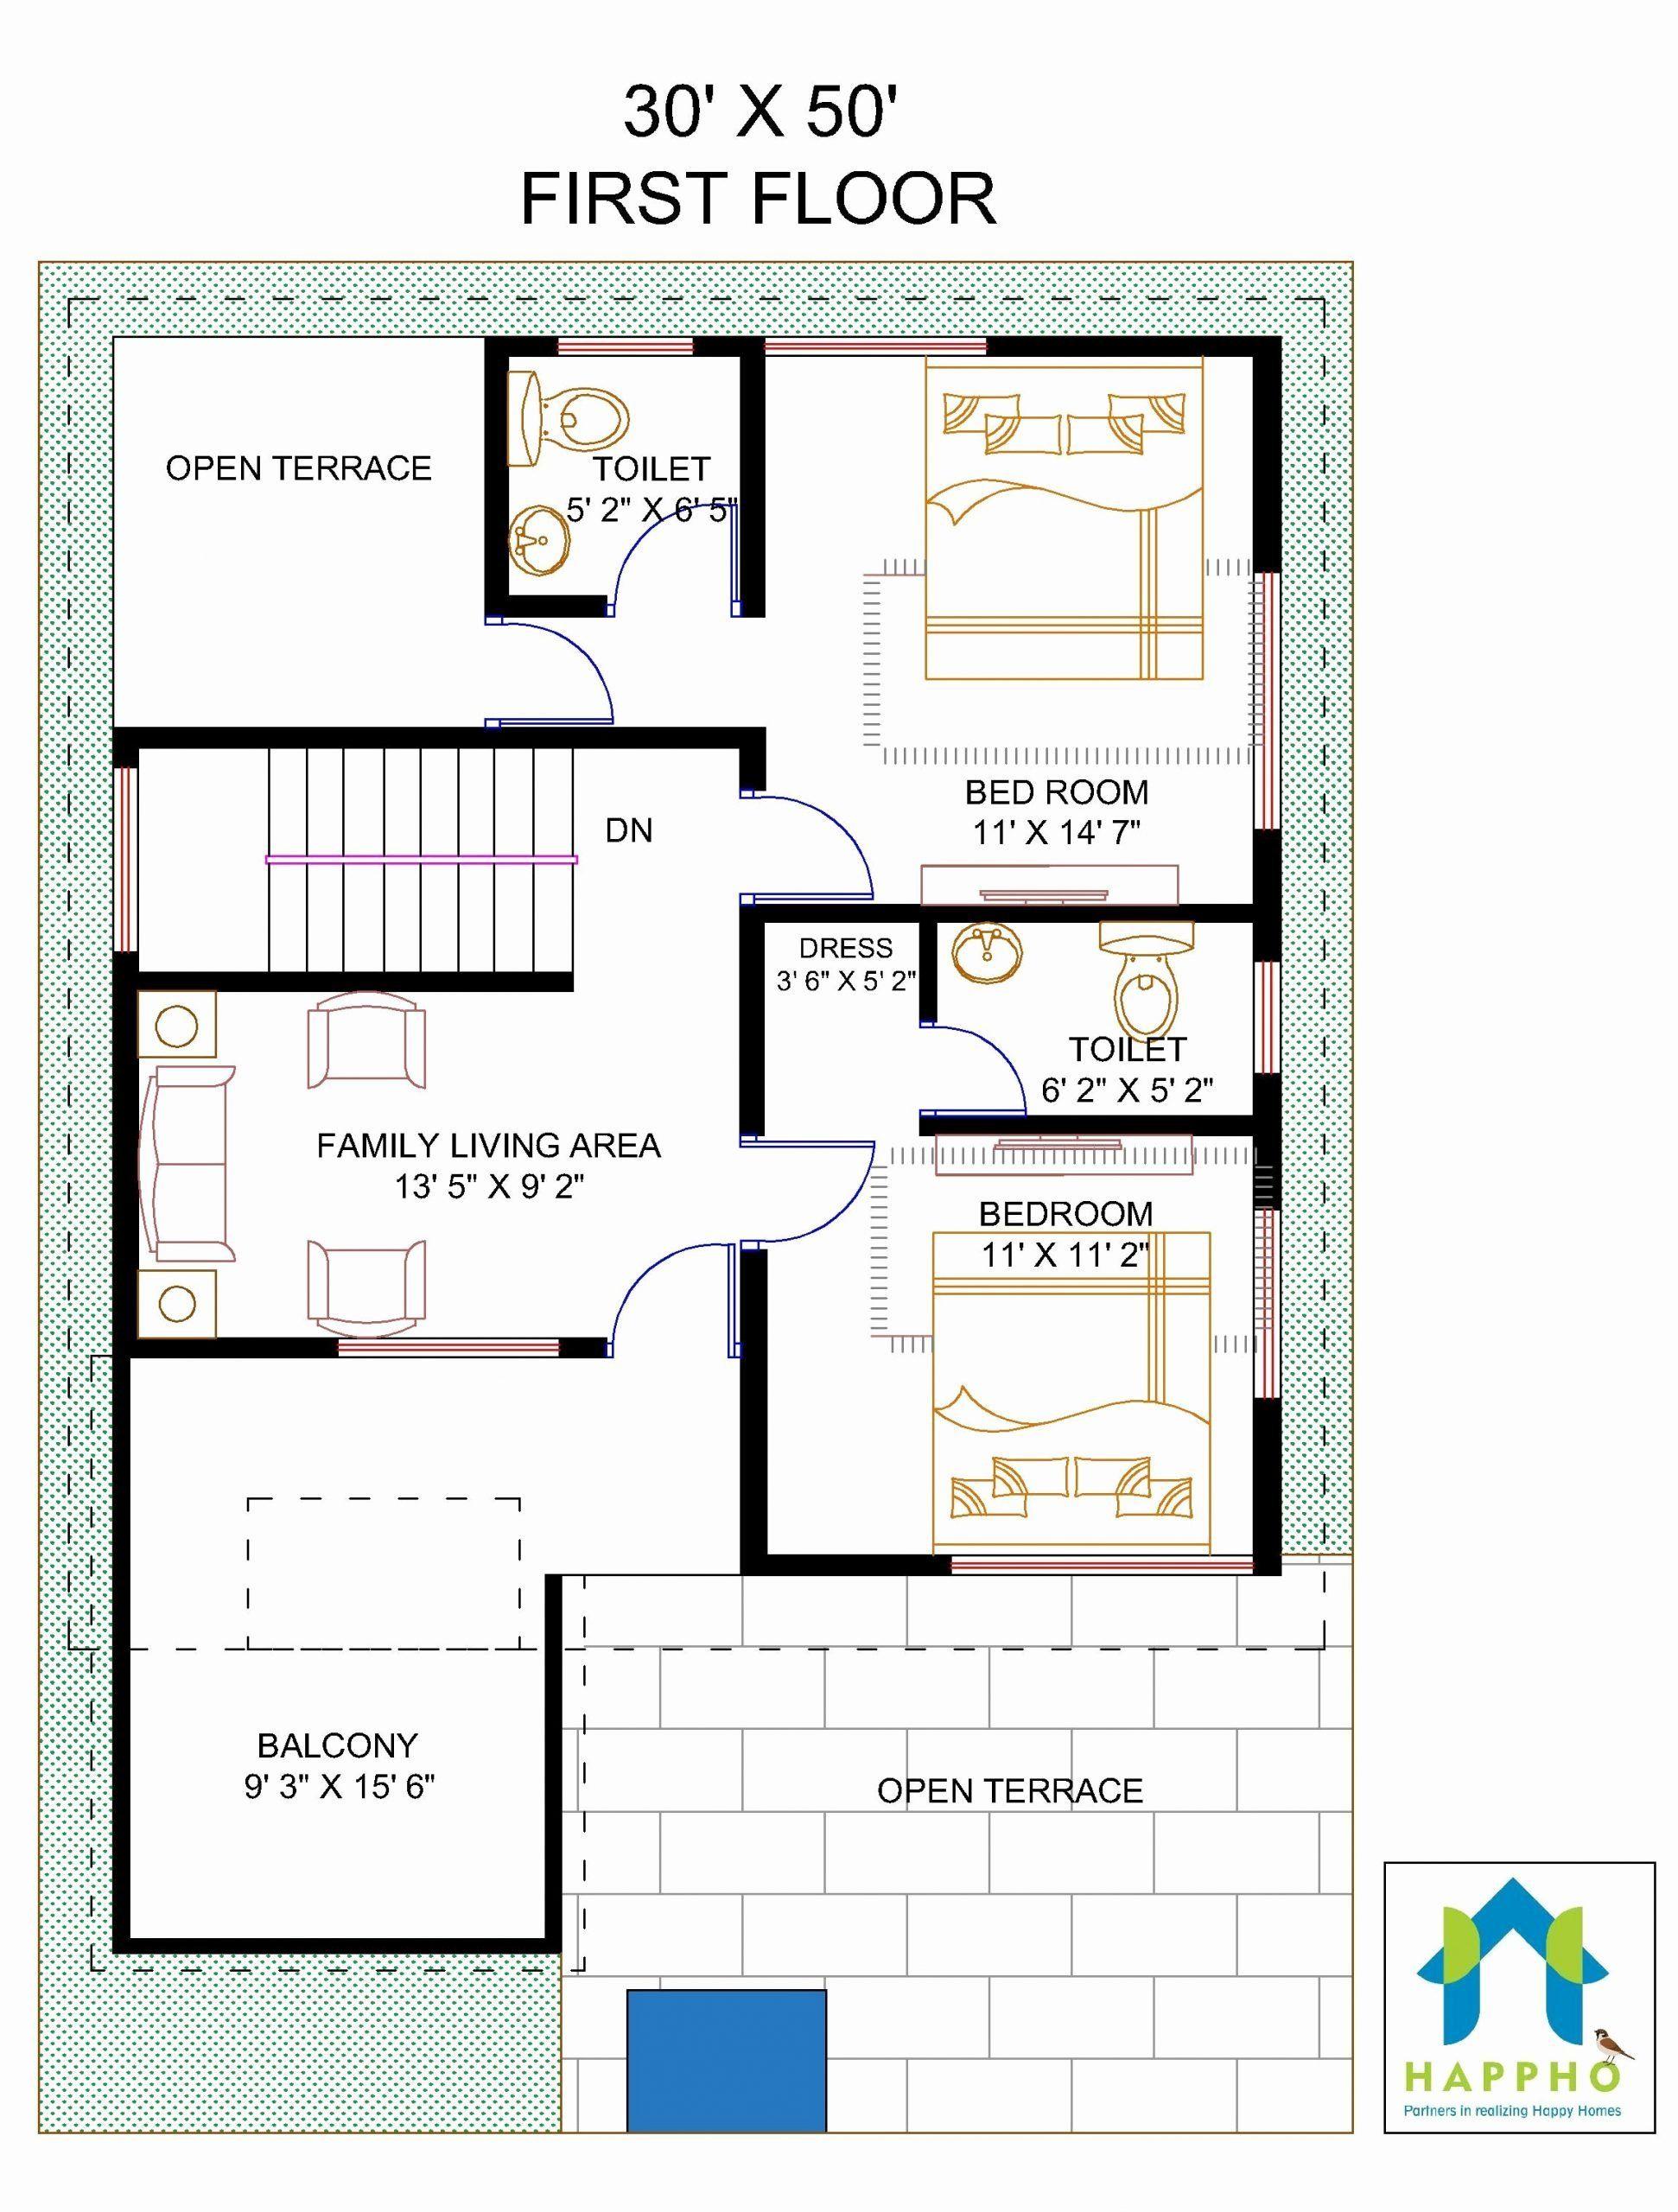 House Plans 1500 Square Feet New Floor Plan For 30 X 50 Feet Plot Square House Plans Unique Floor Plans House Design